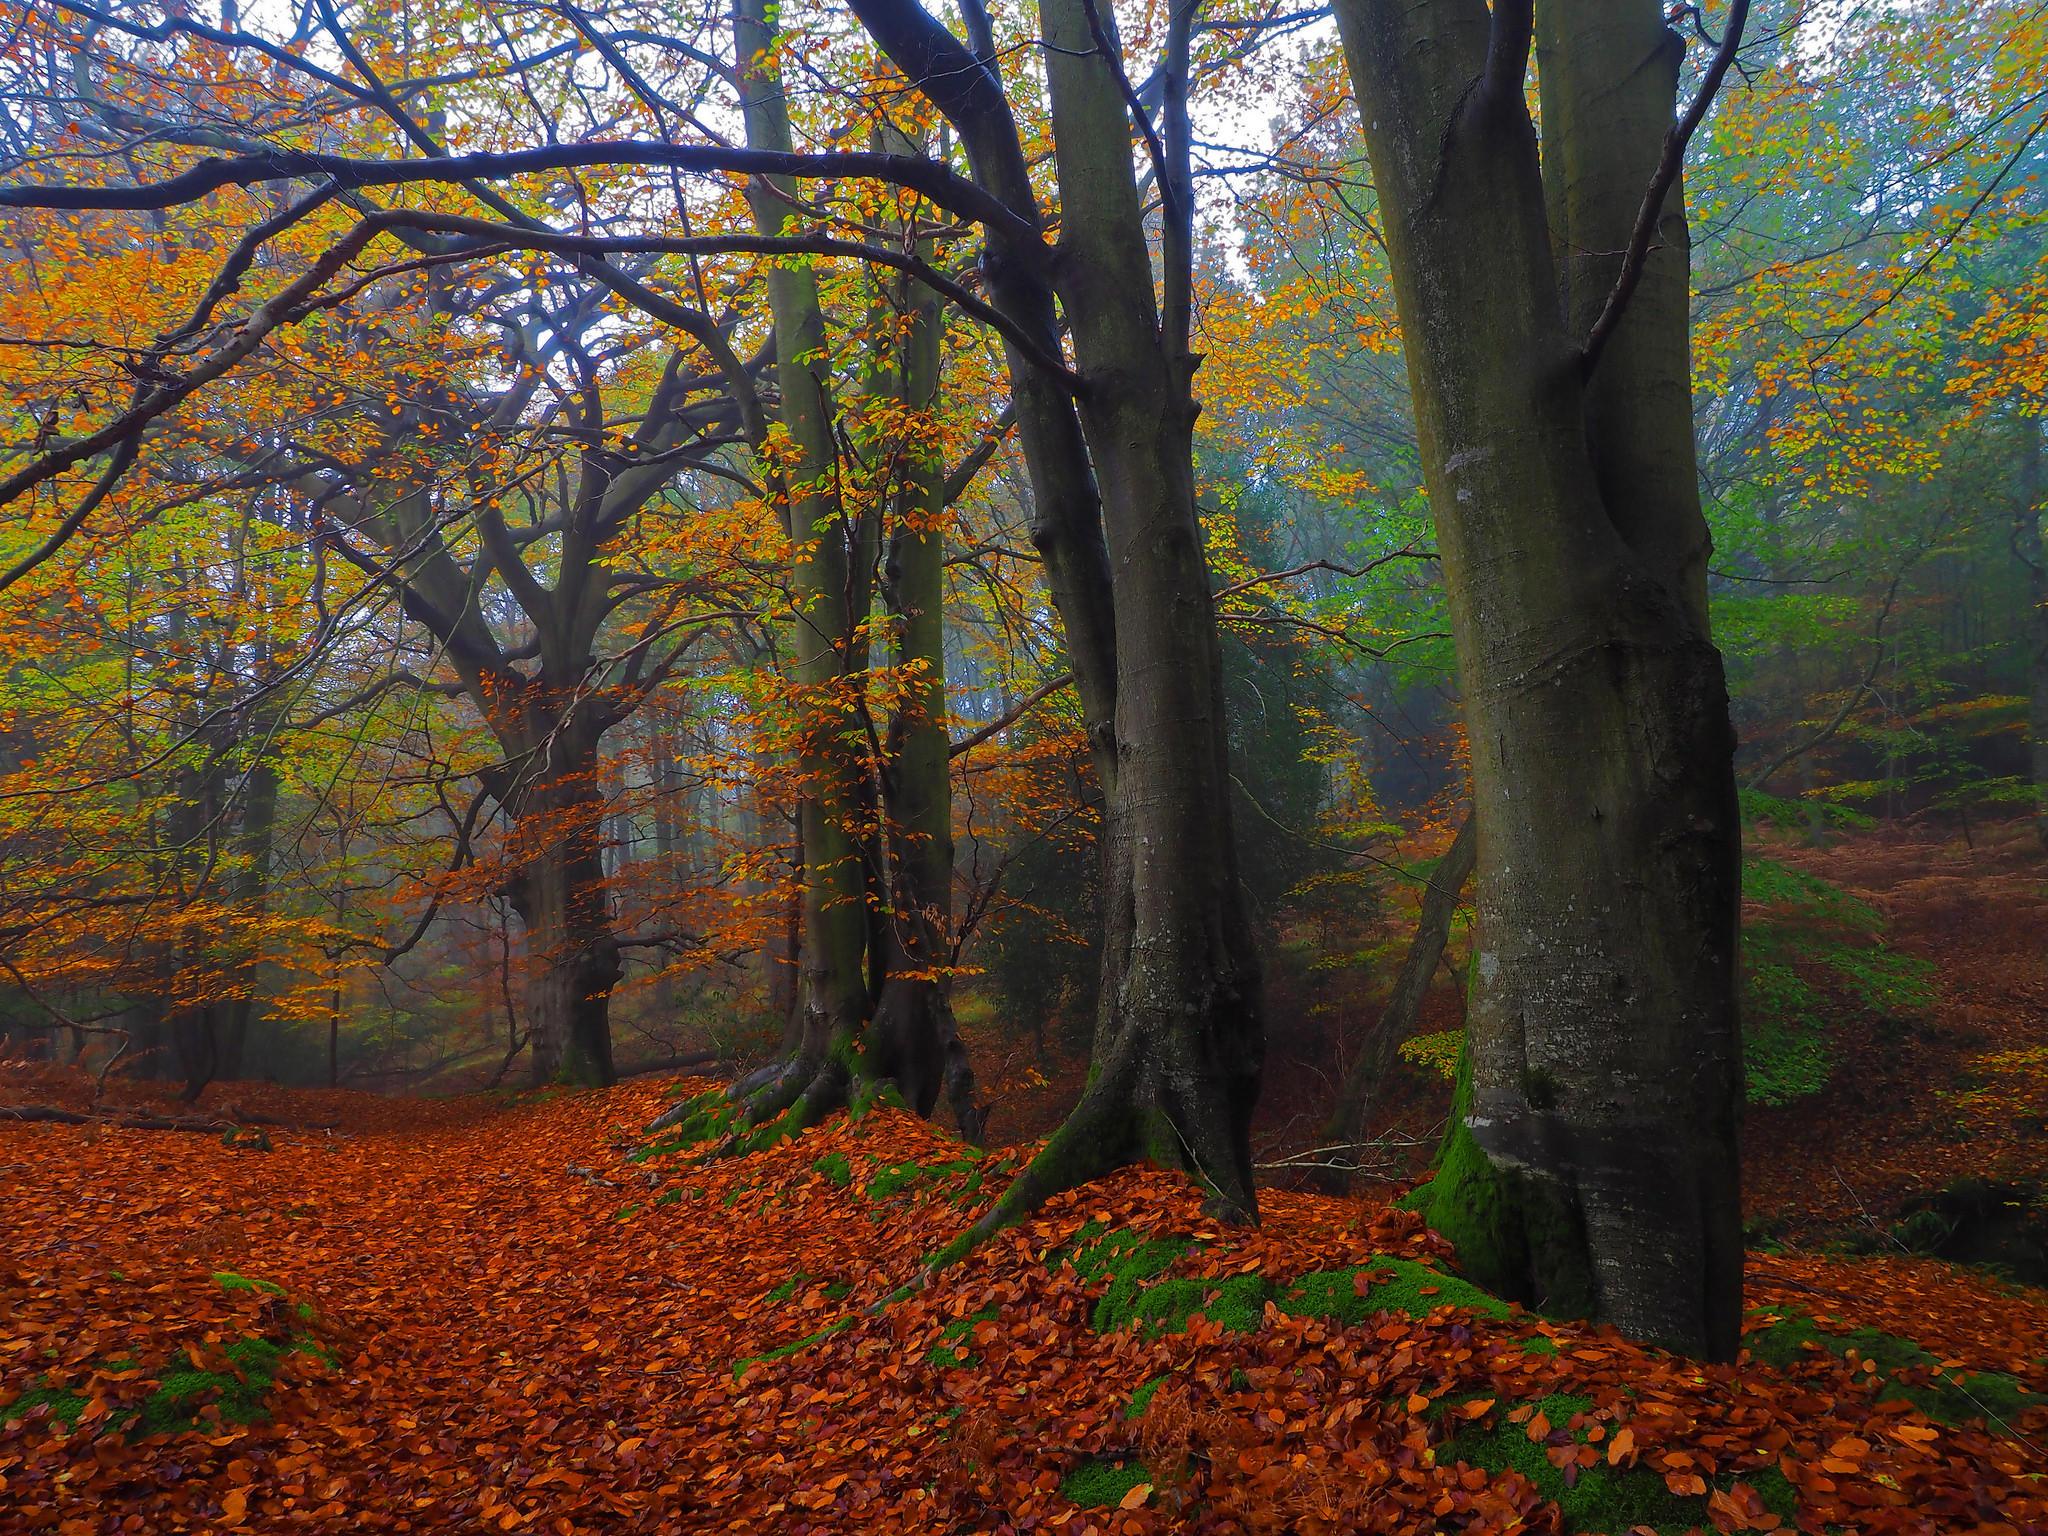 осень, лес, деревья, пейзщаж